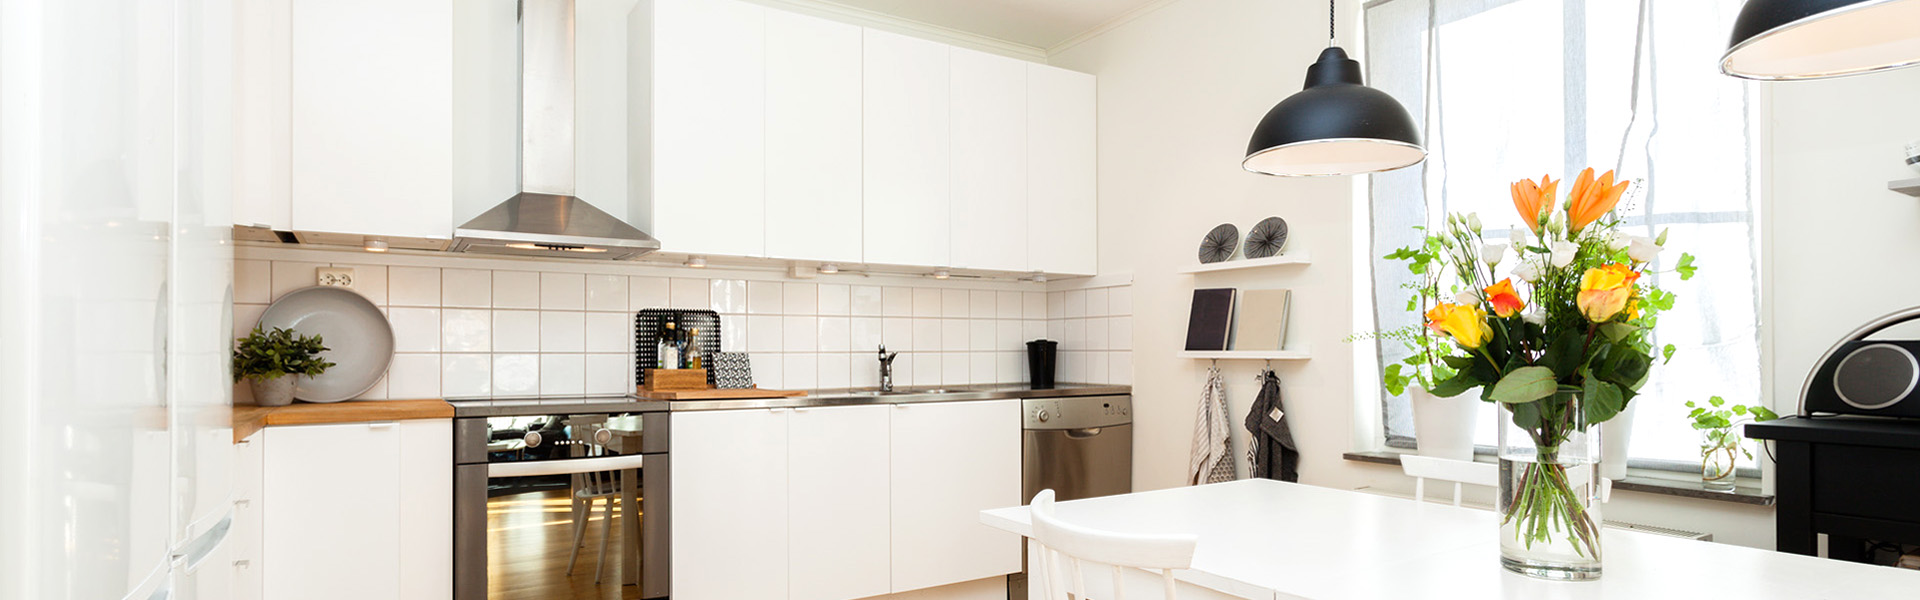 Jarso cocinas mobiliario y complementos dise o - Cocinas san sebastian ...